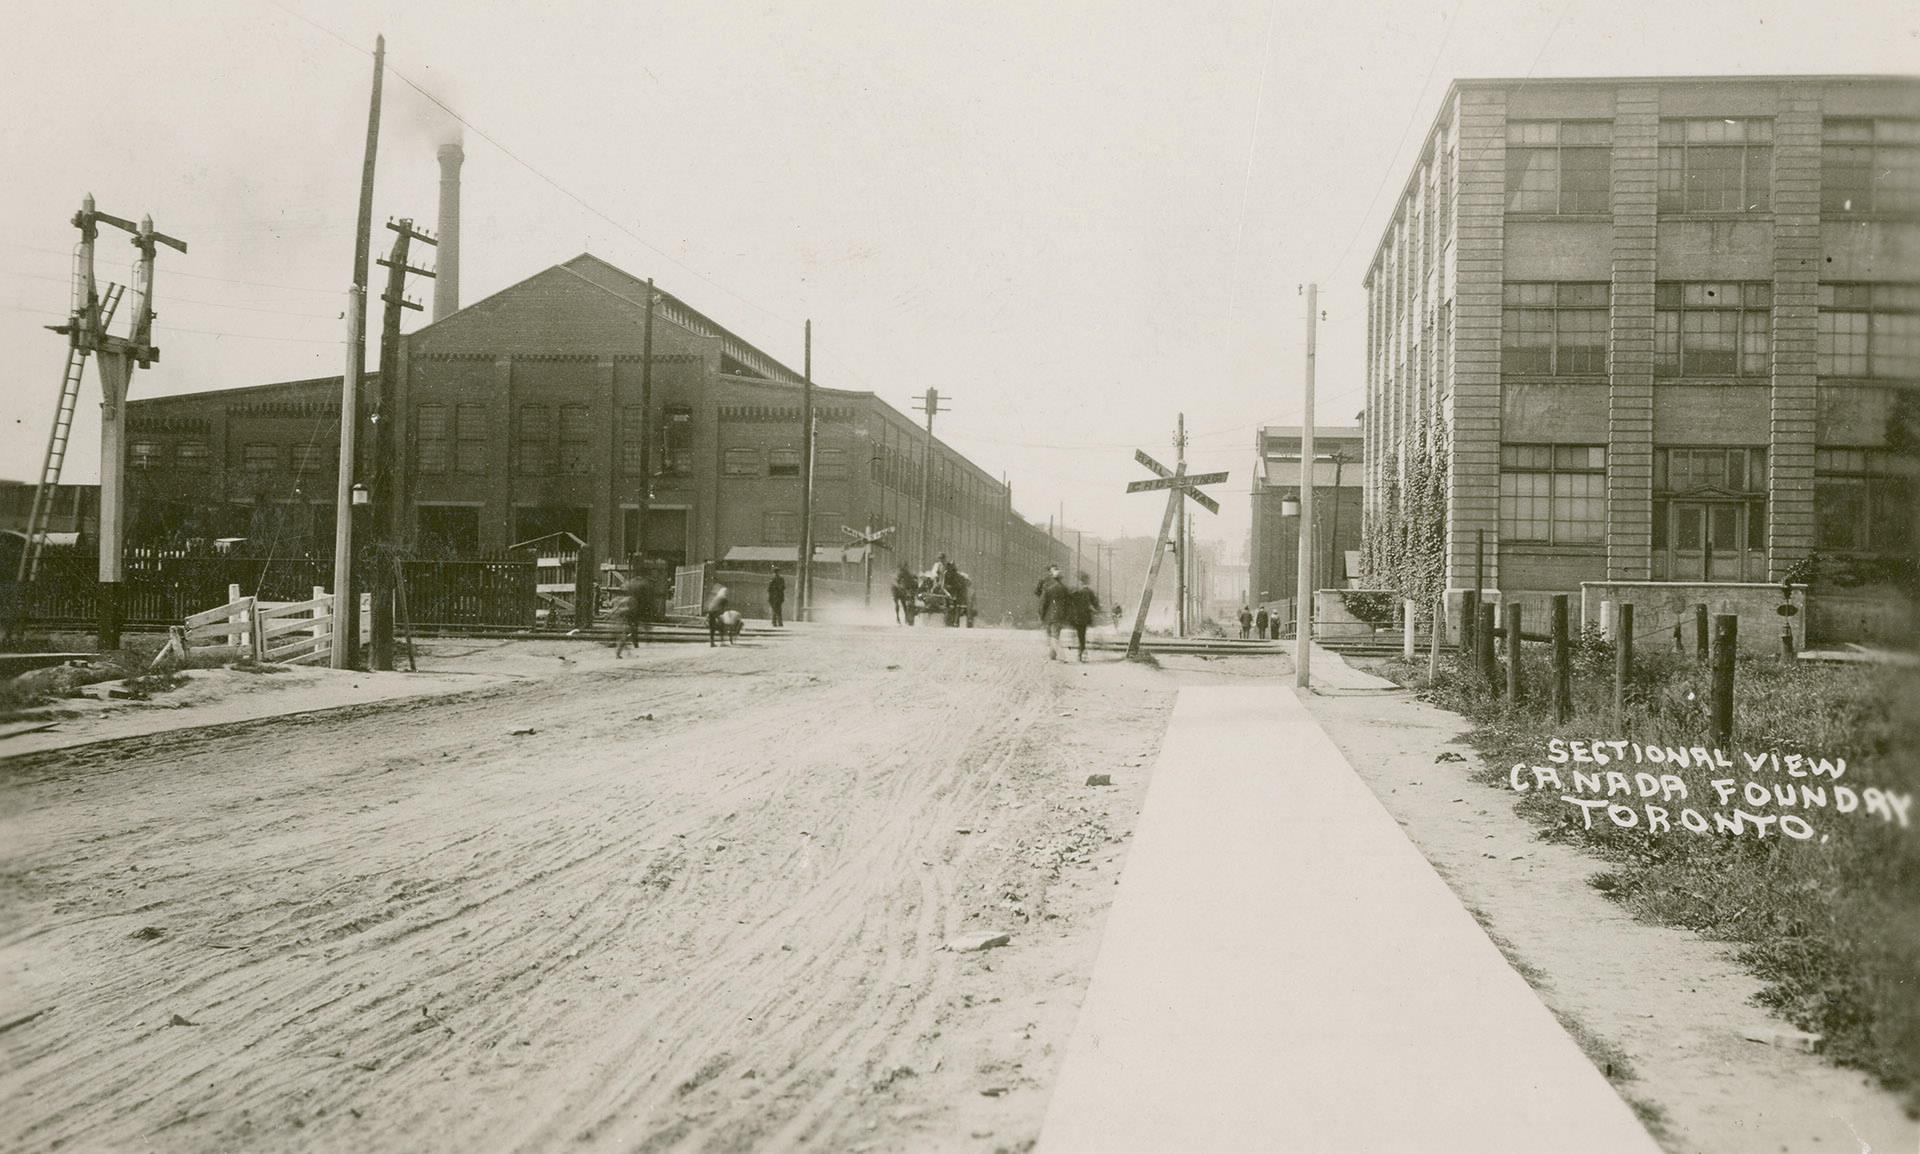 Canada Foundry, Lansdowne Avenue